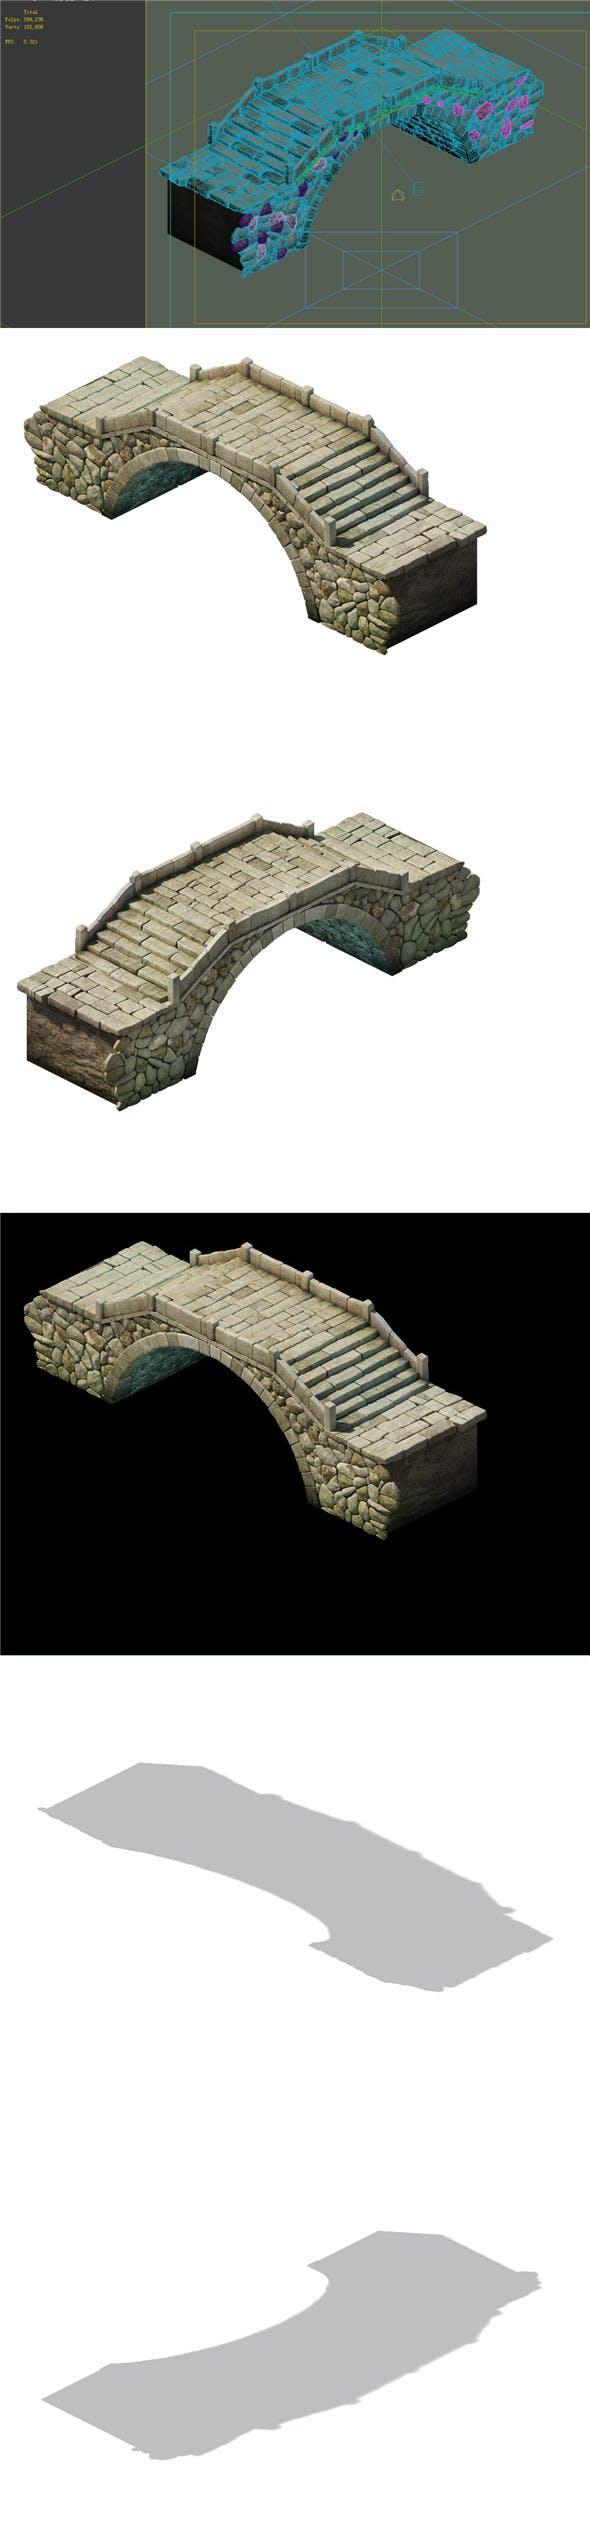 Game Model - prairie scene - Stone Bridge 01 - 3DOcean Item for Sale